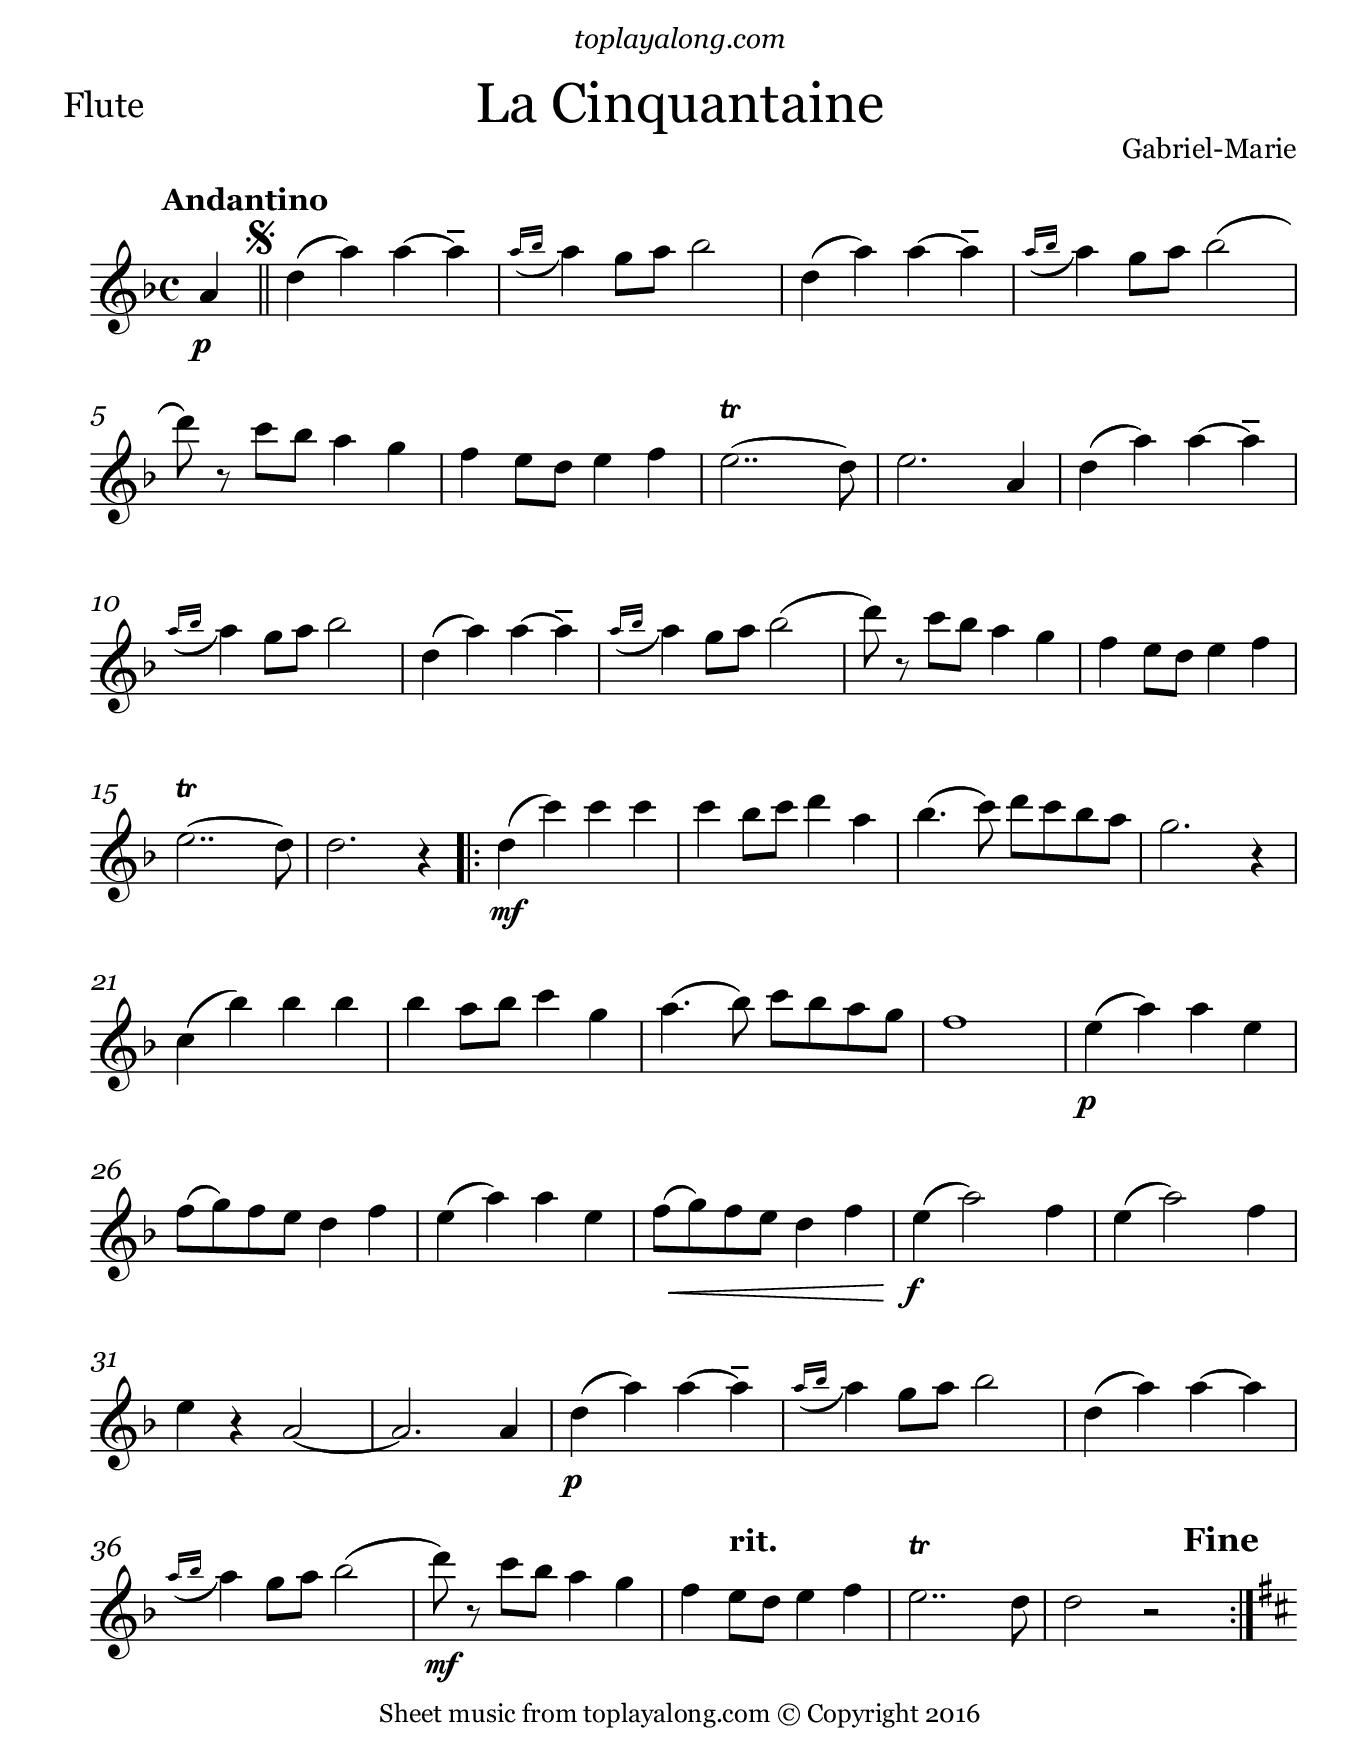 La Cinquantaine by Gabriel-Marie. Sheet music for Flute, page 1.